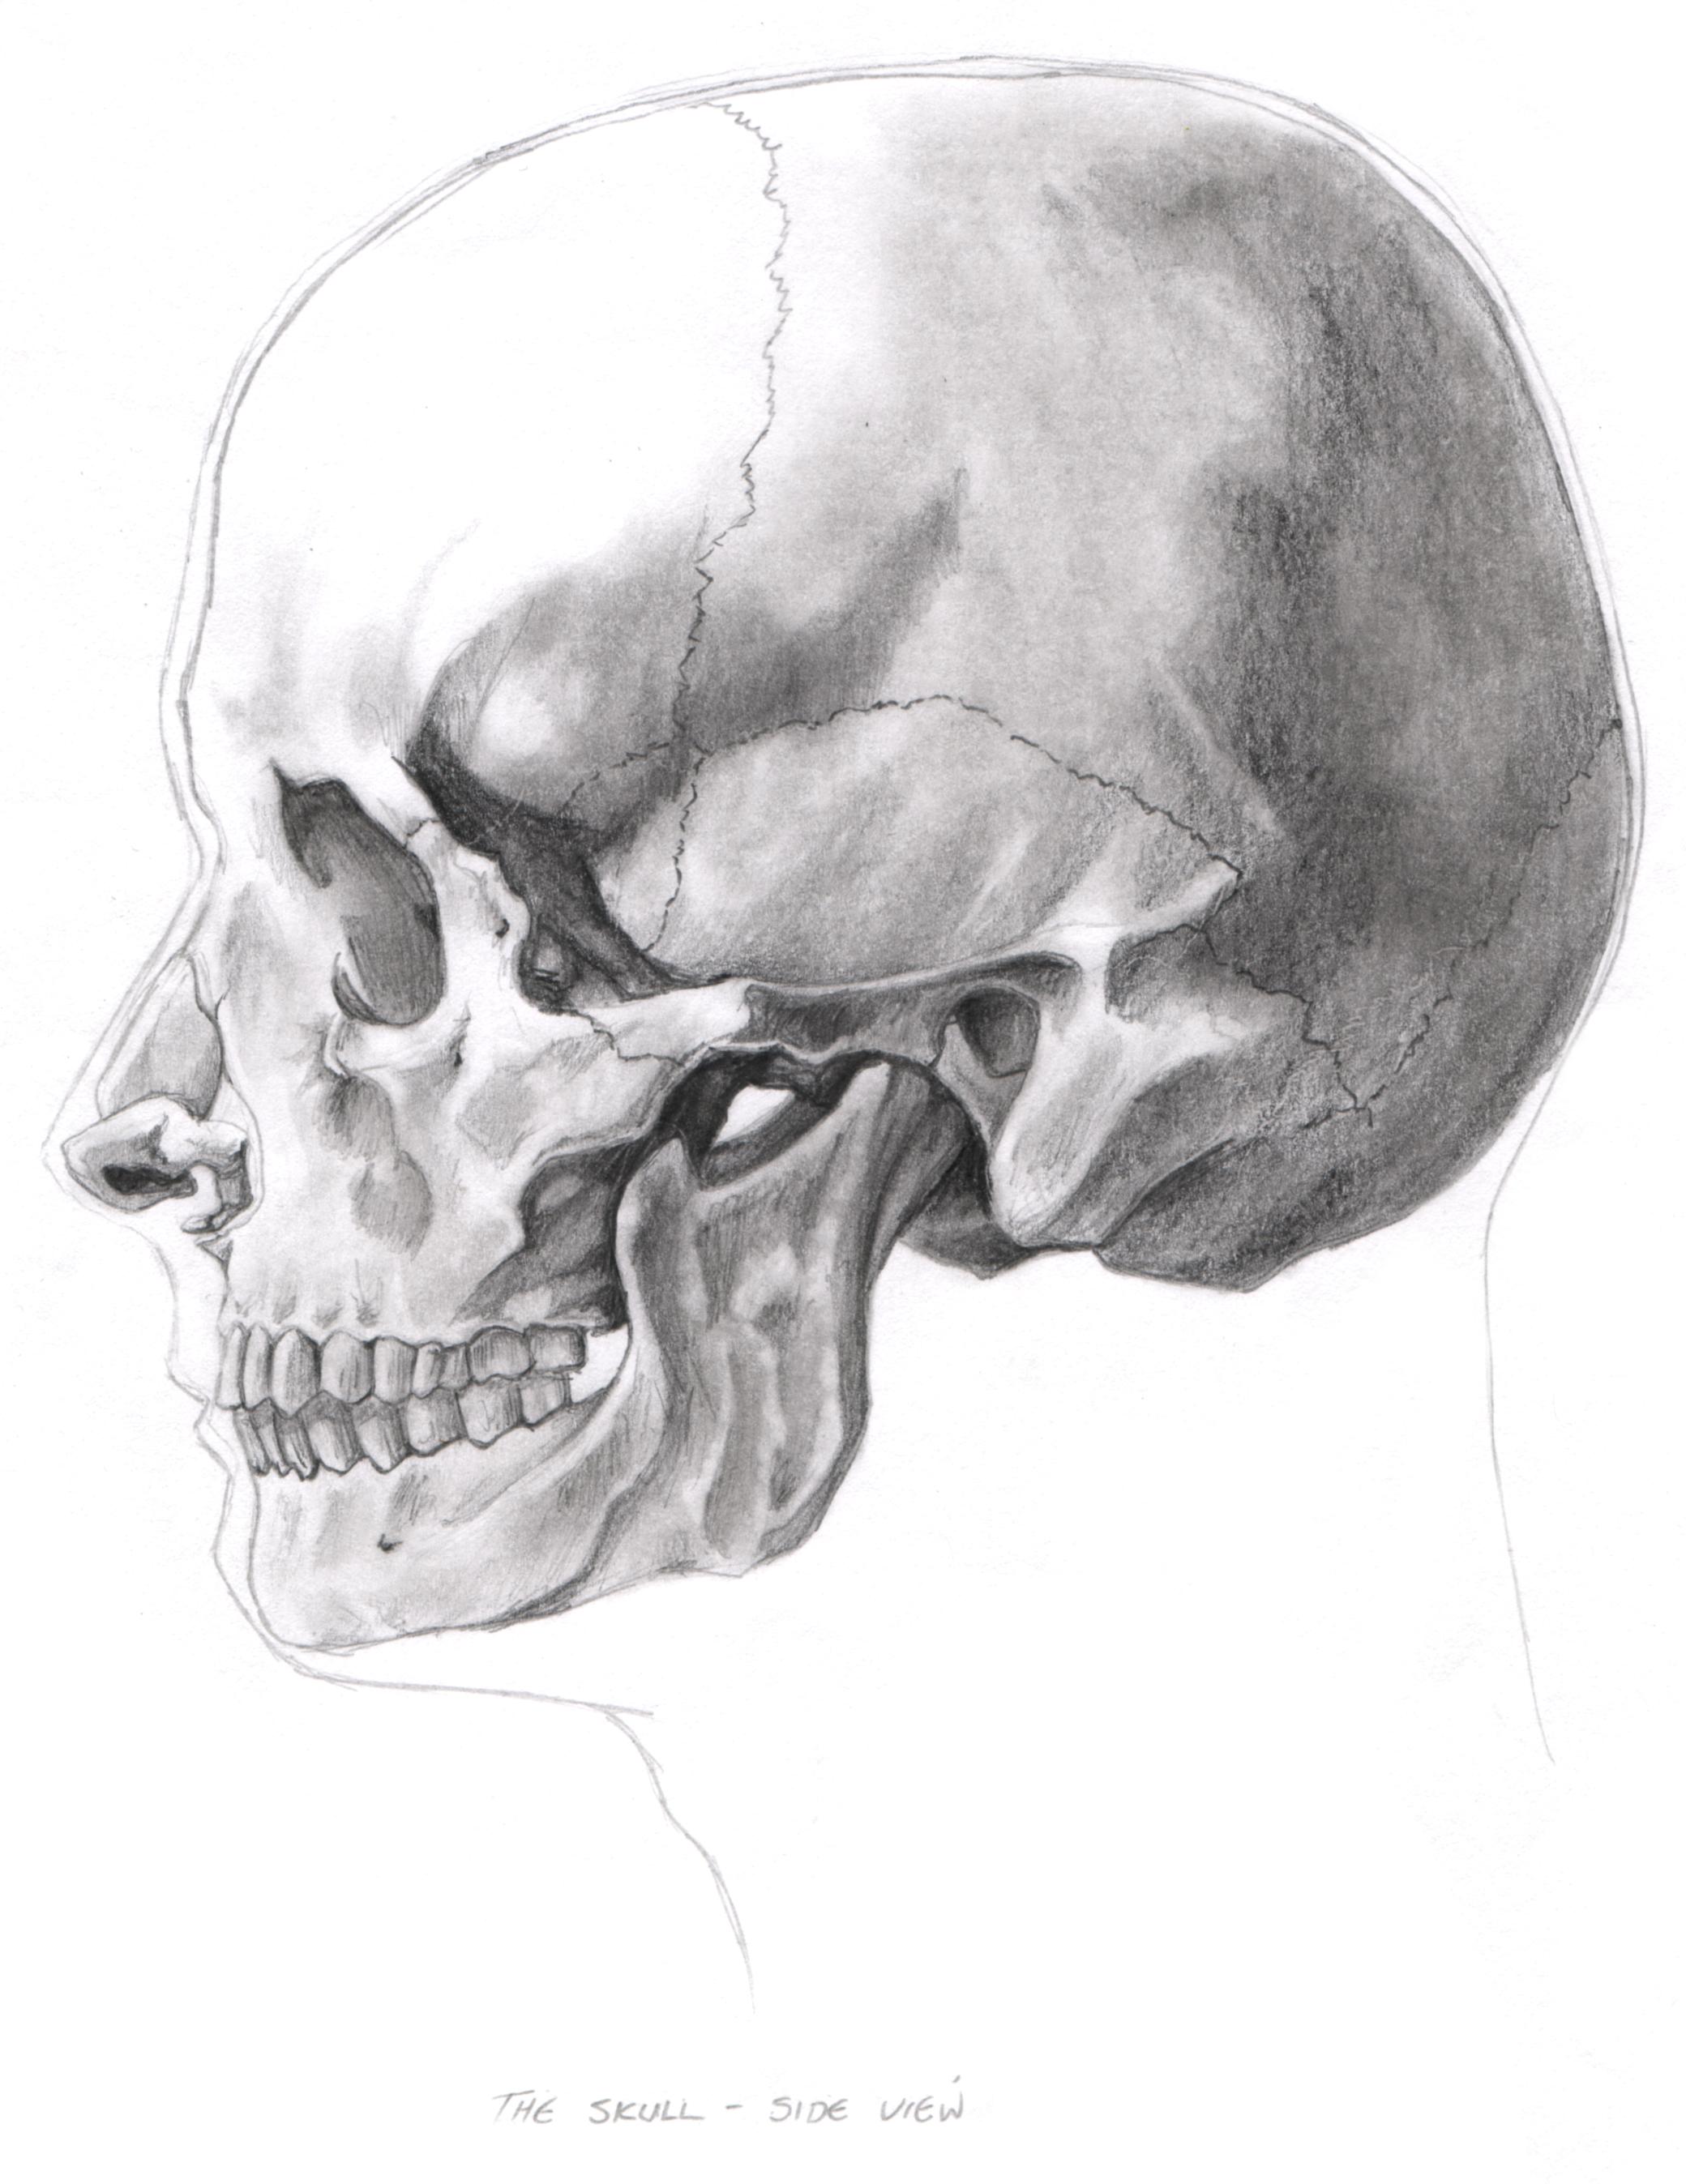 Danielle Kerr - Facial Anatomy Studies